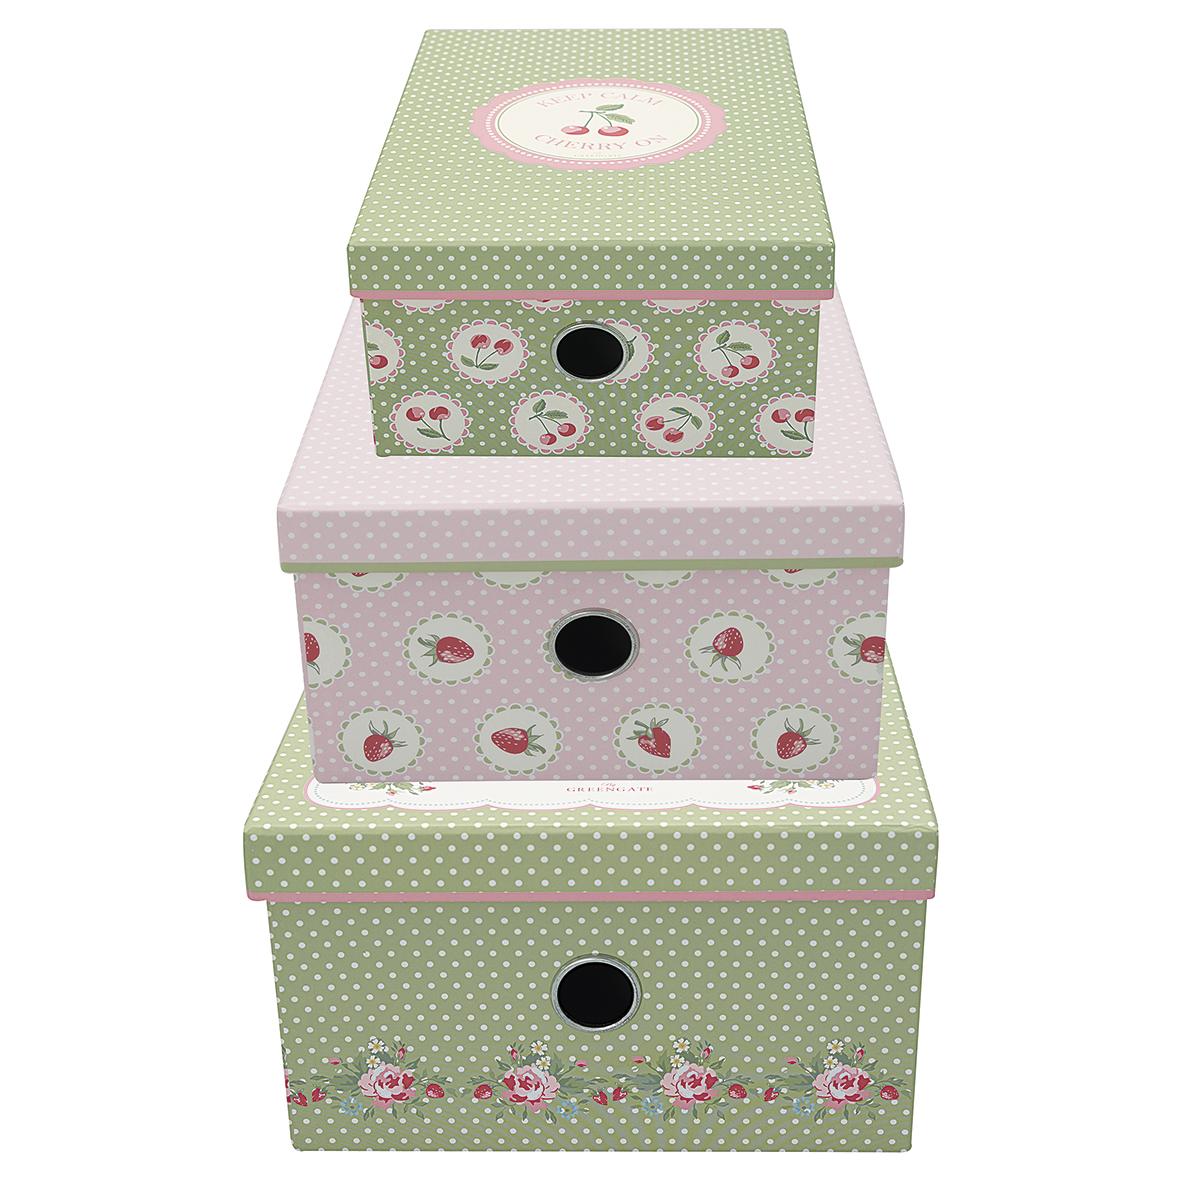 GreenGate Förvaringsbox Fyrkantig, Mary White, 3 storlekar